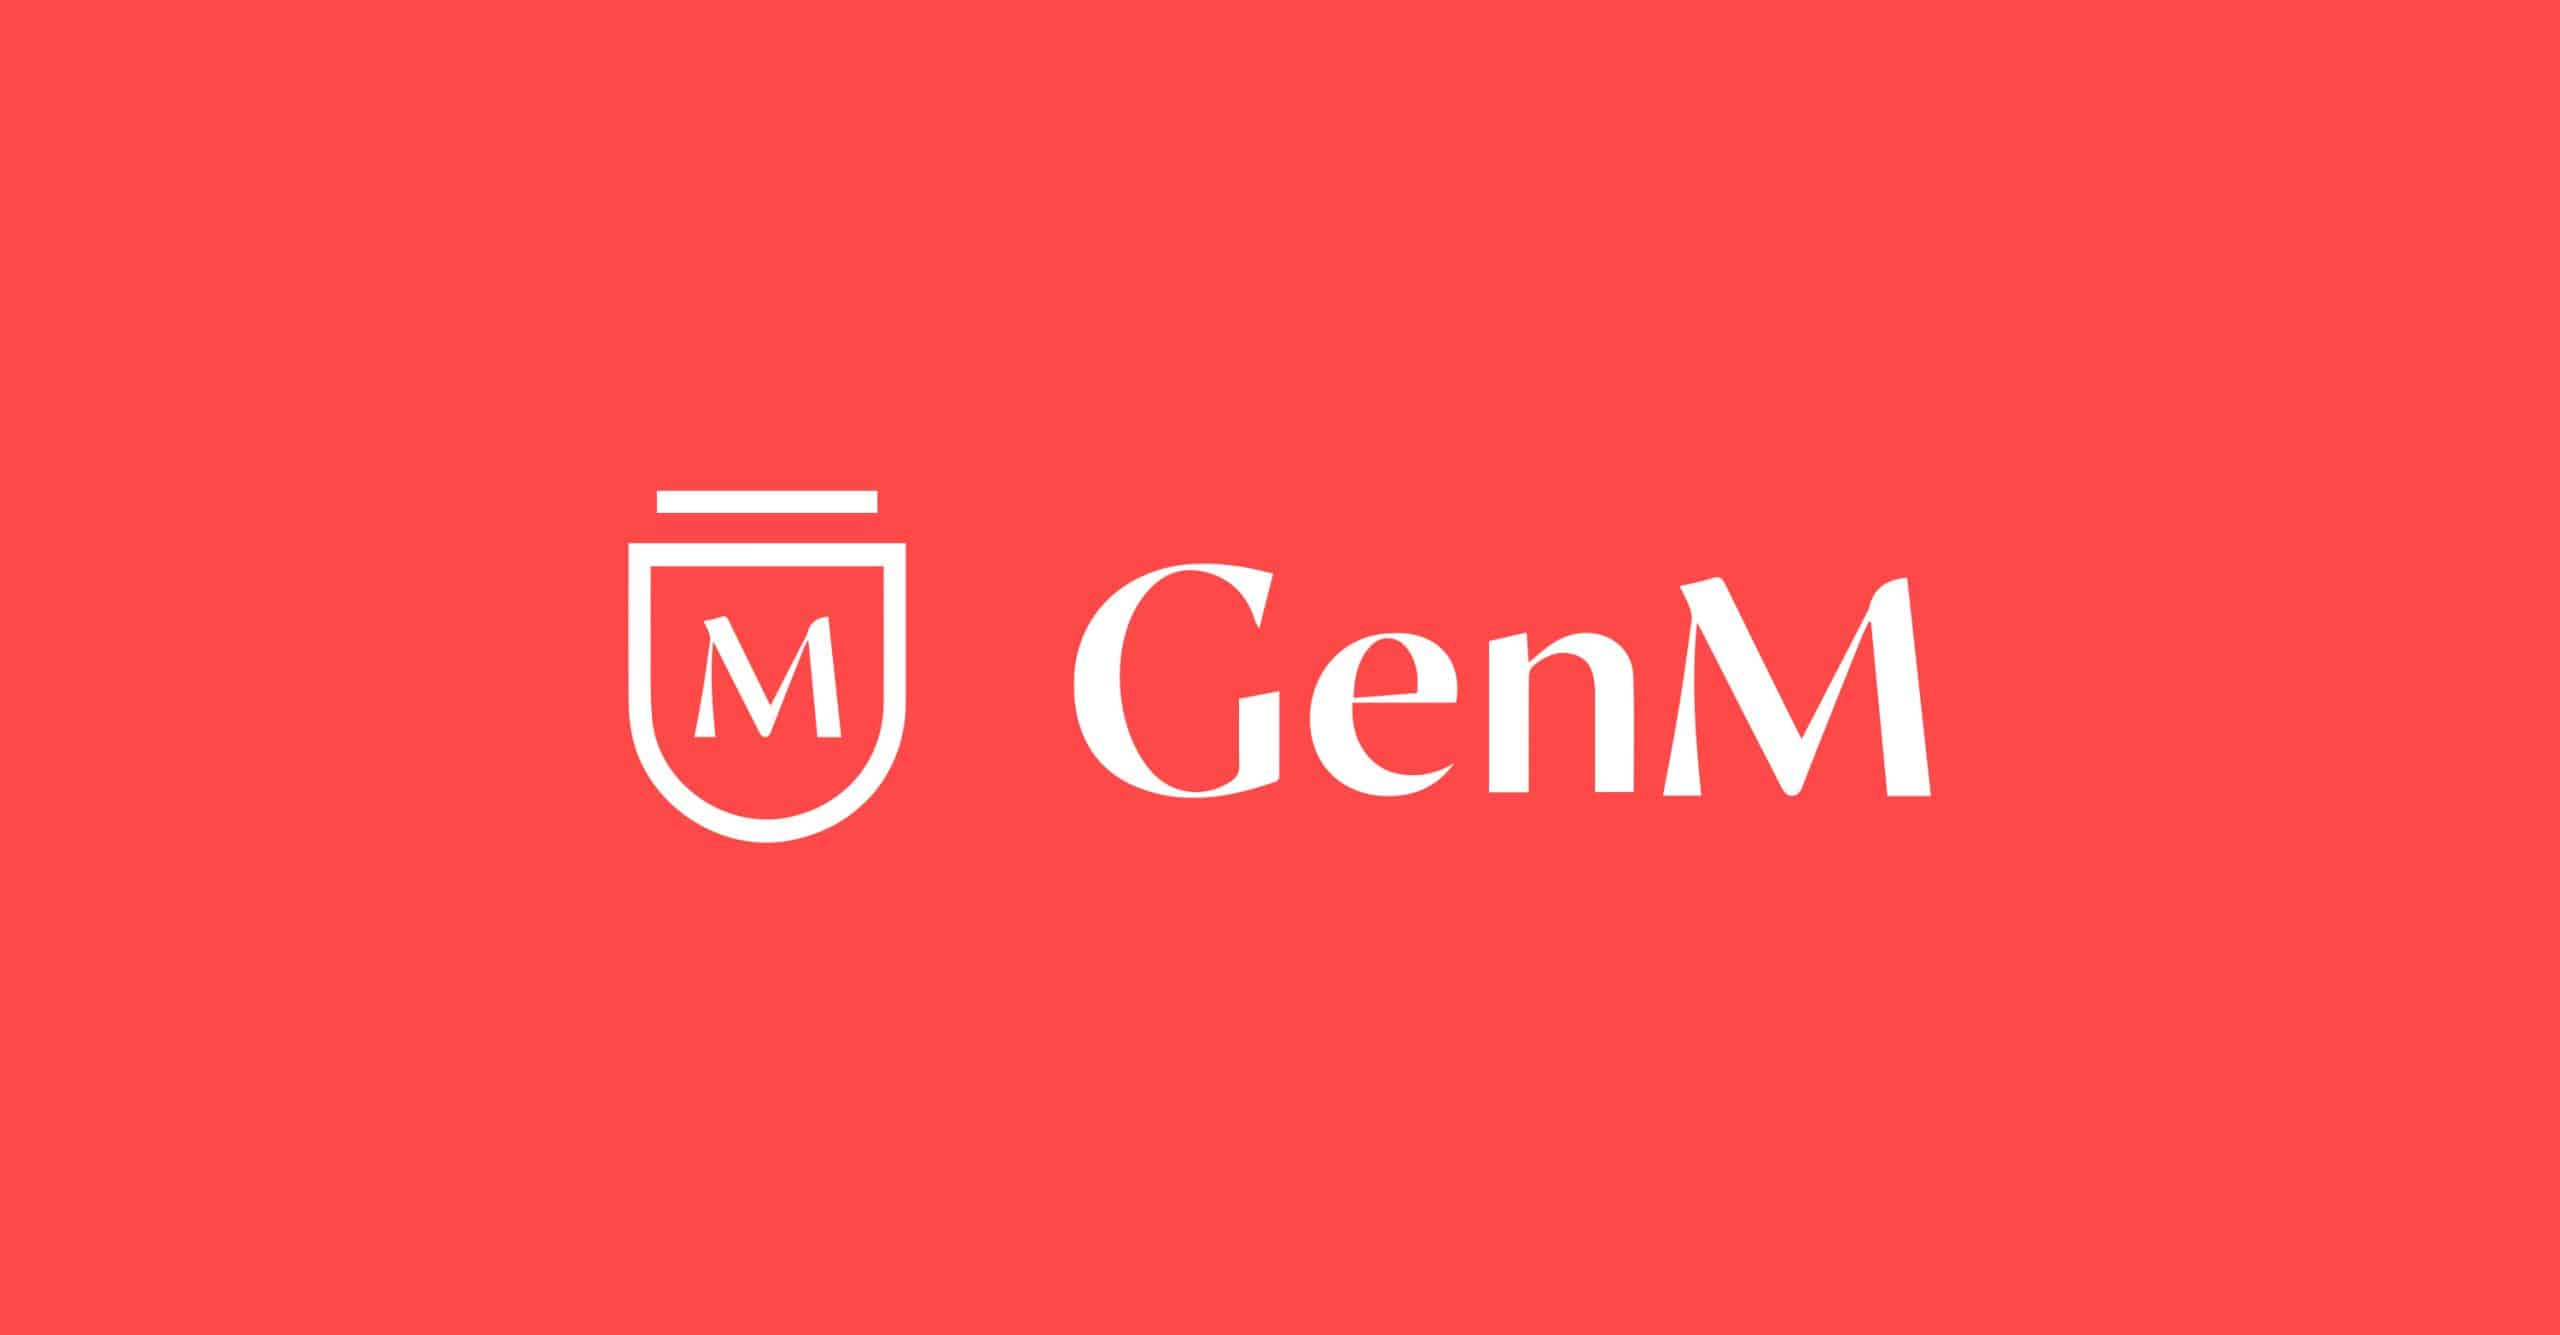 Review: GenM Marketing Apprentice Platform